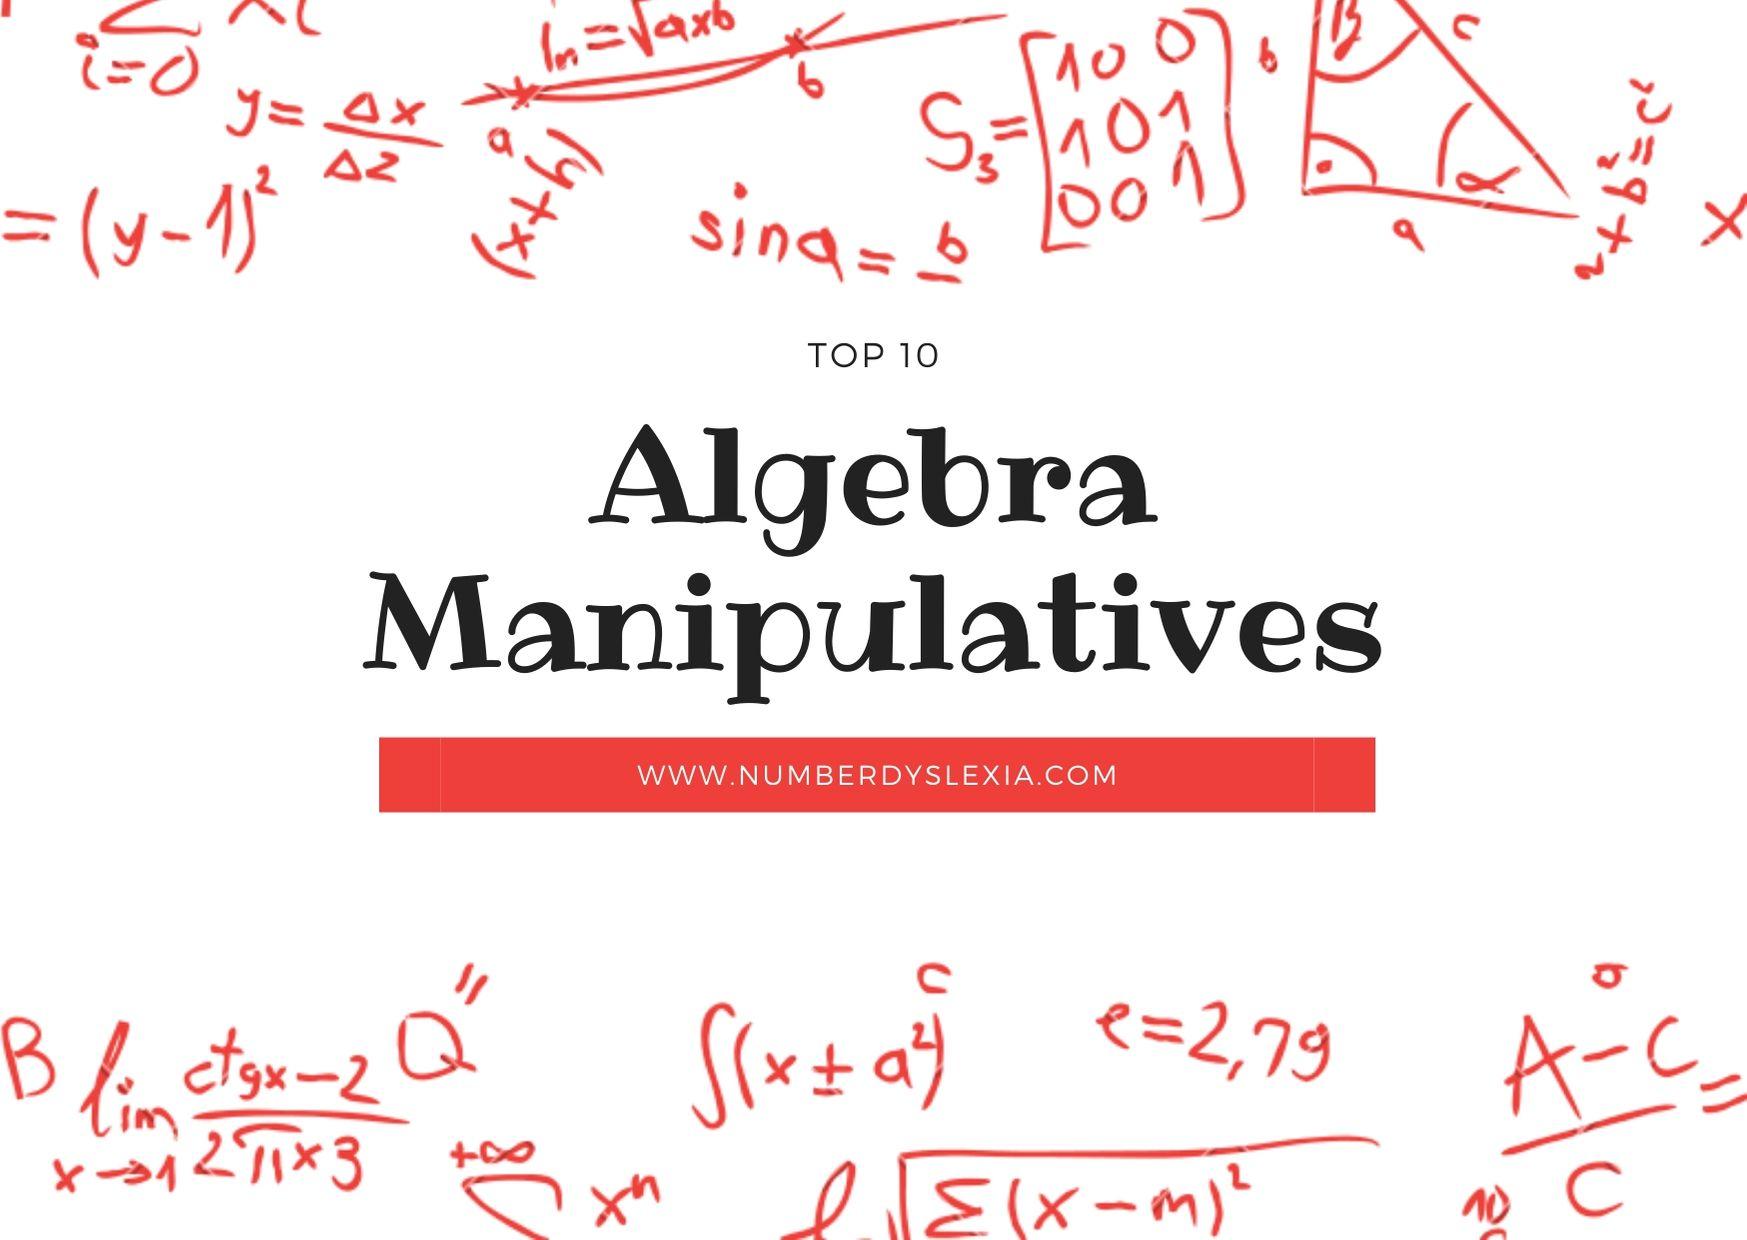 a list of top 10 manipulatives for algebra